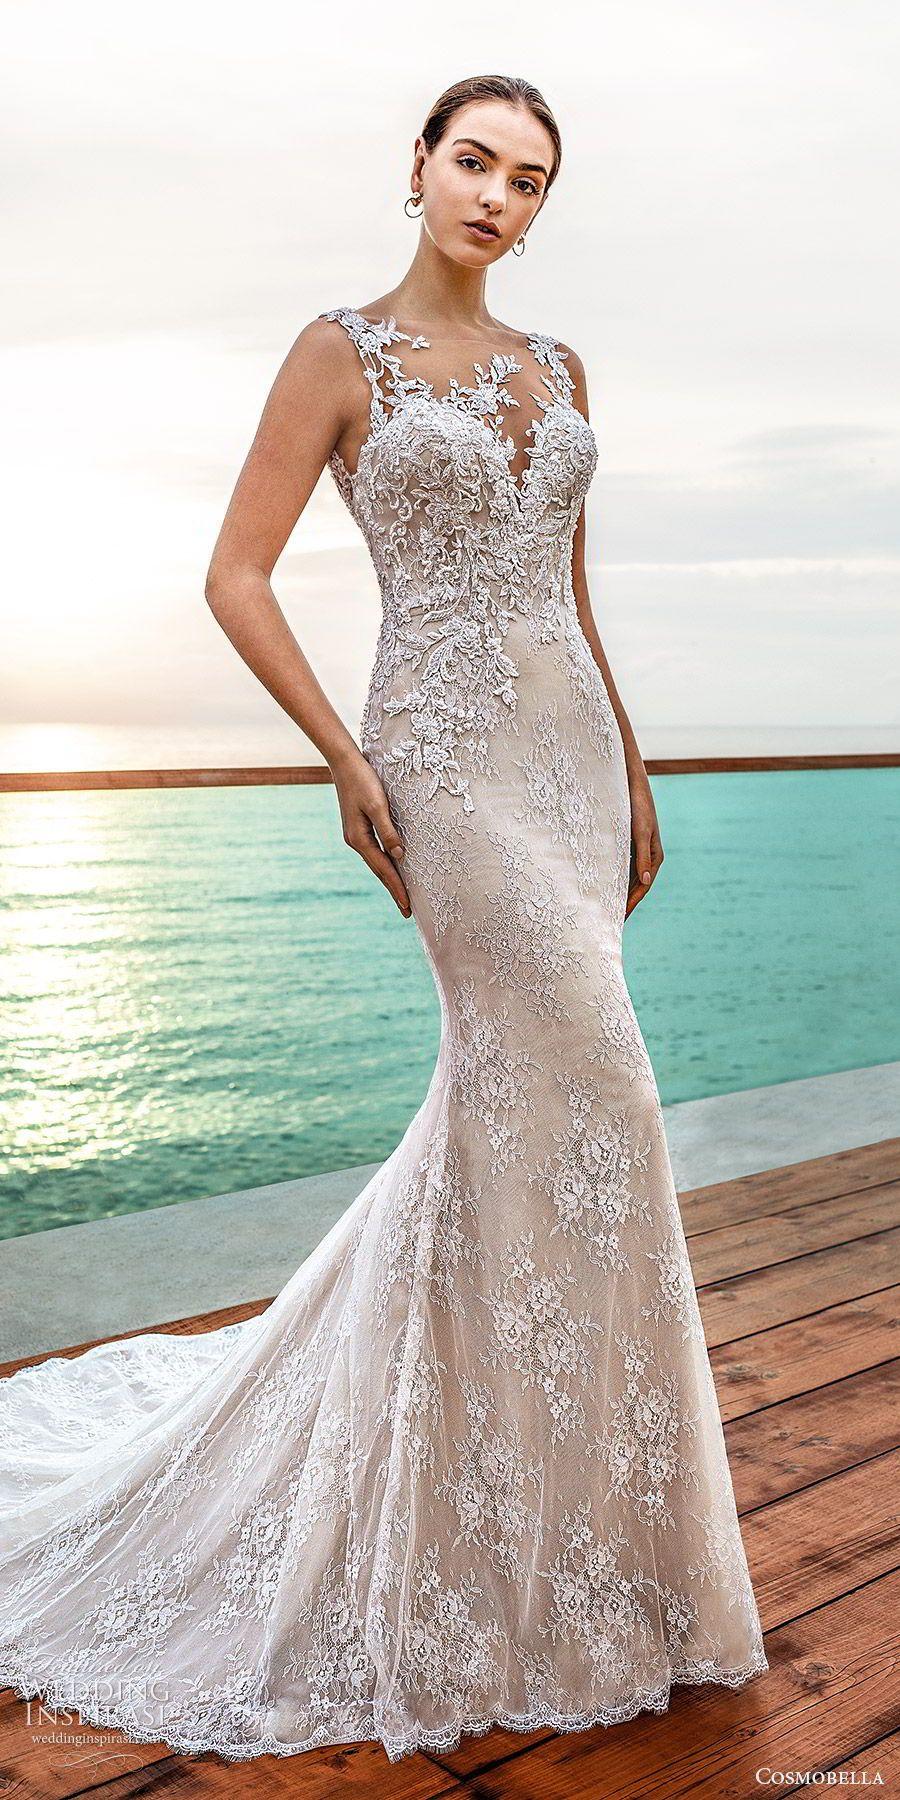 Cosmobella 2020 wedding dresses eterea eleganza bridal